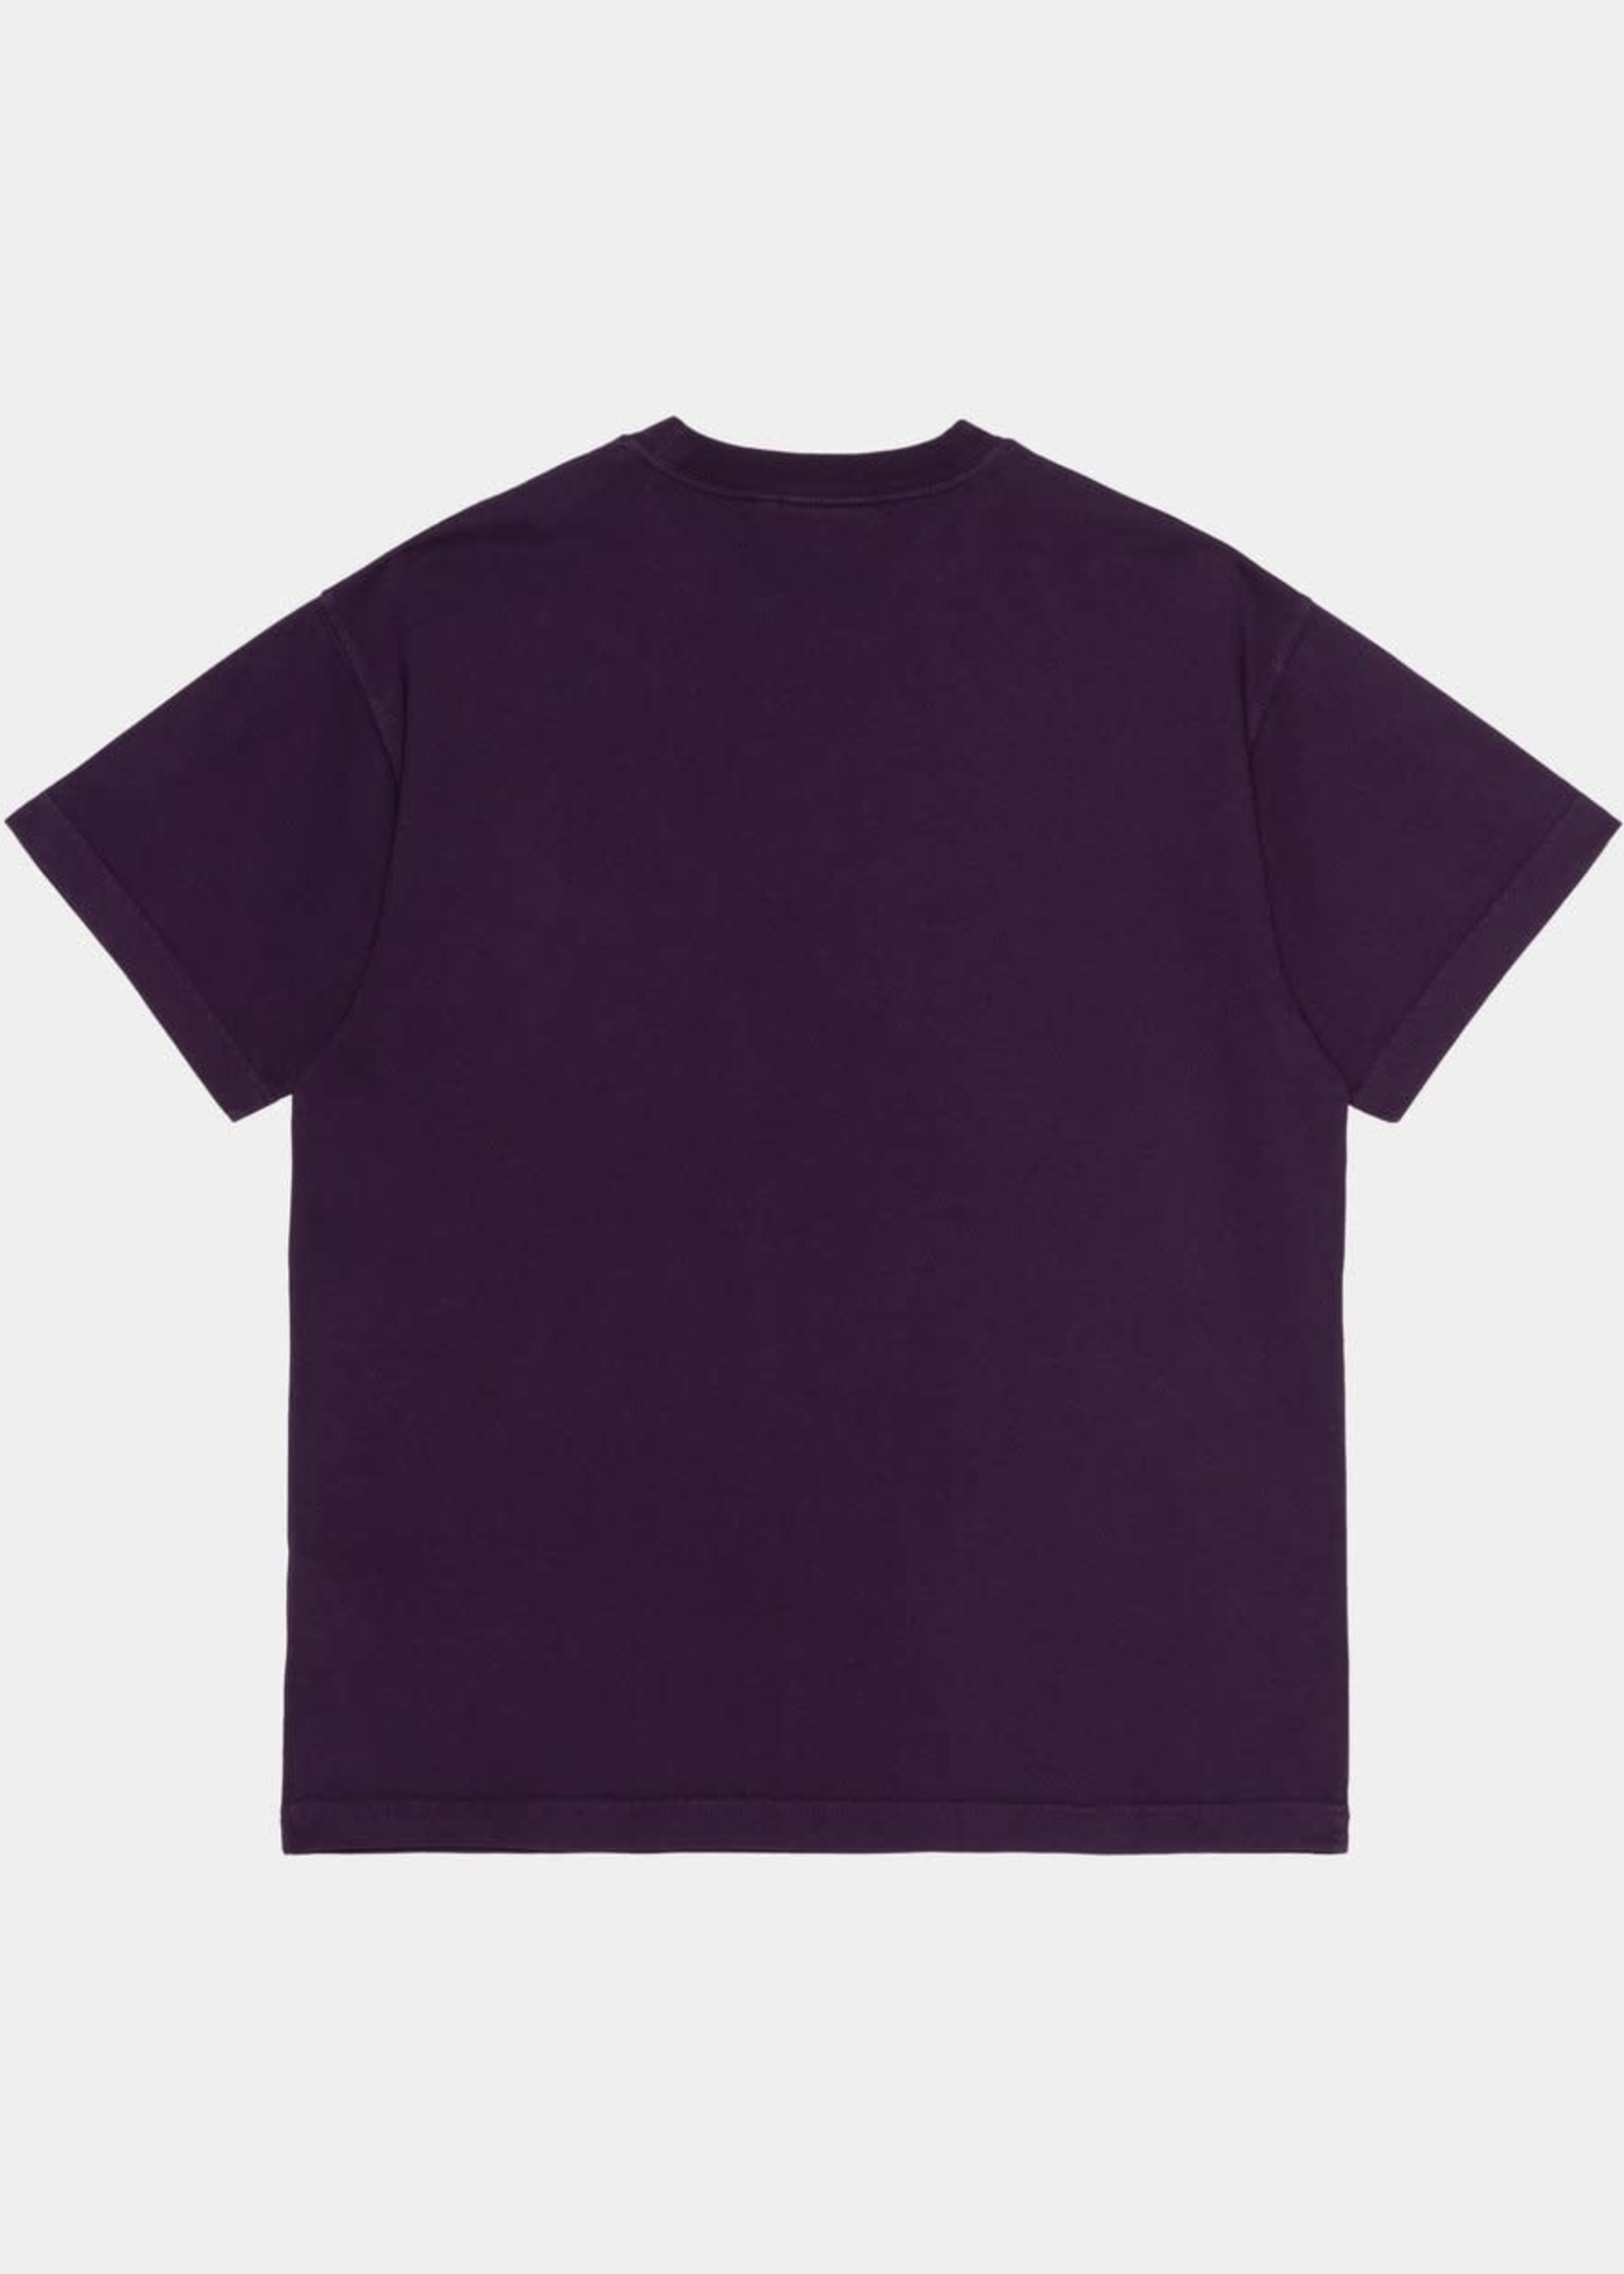 Carhartt Work In Progress Vista T-shirt in Dark Iris